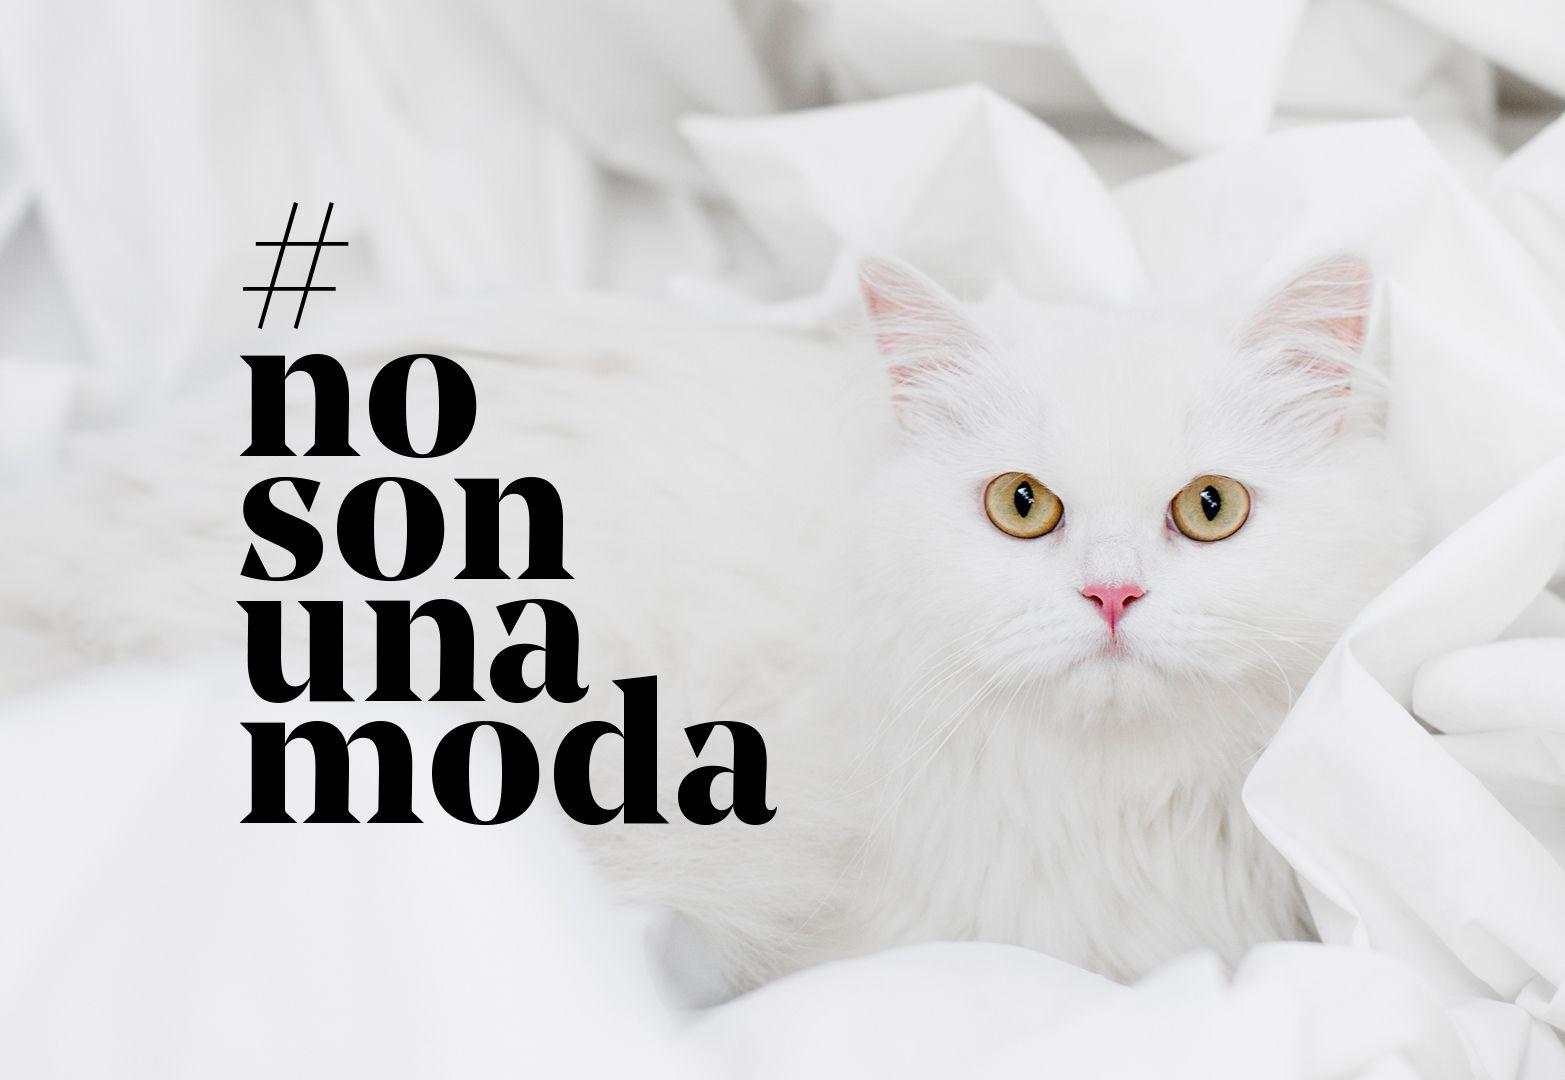 nosonunamodafundacion-affinity